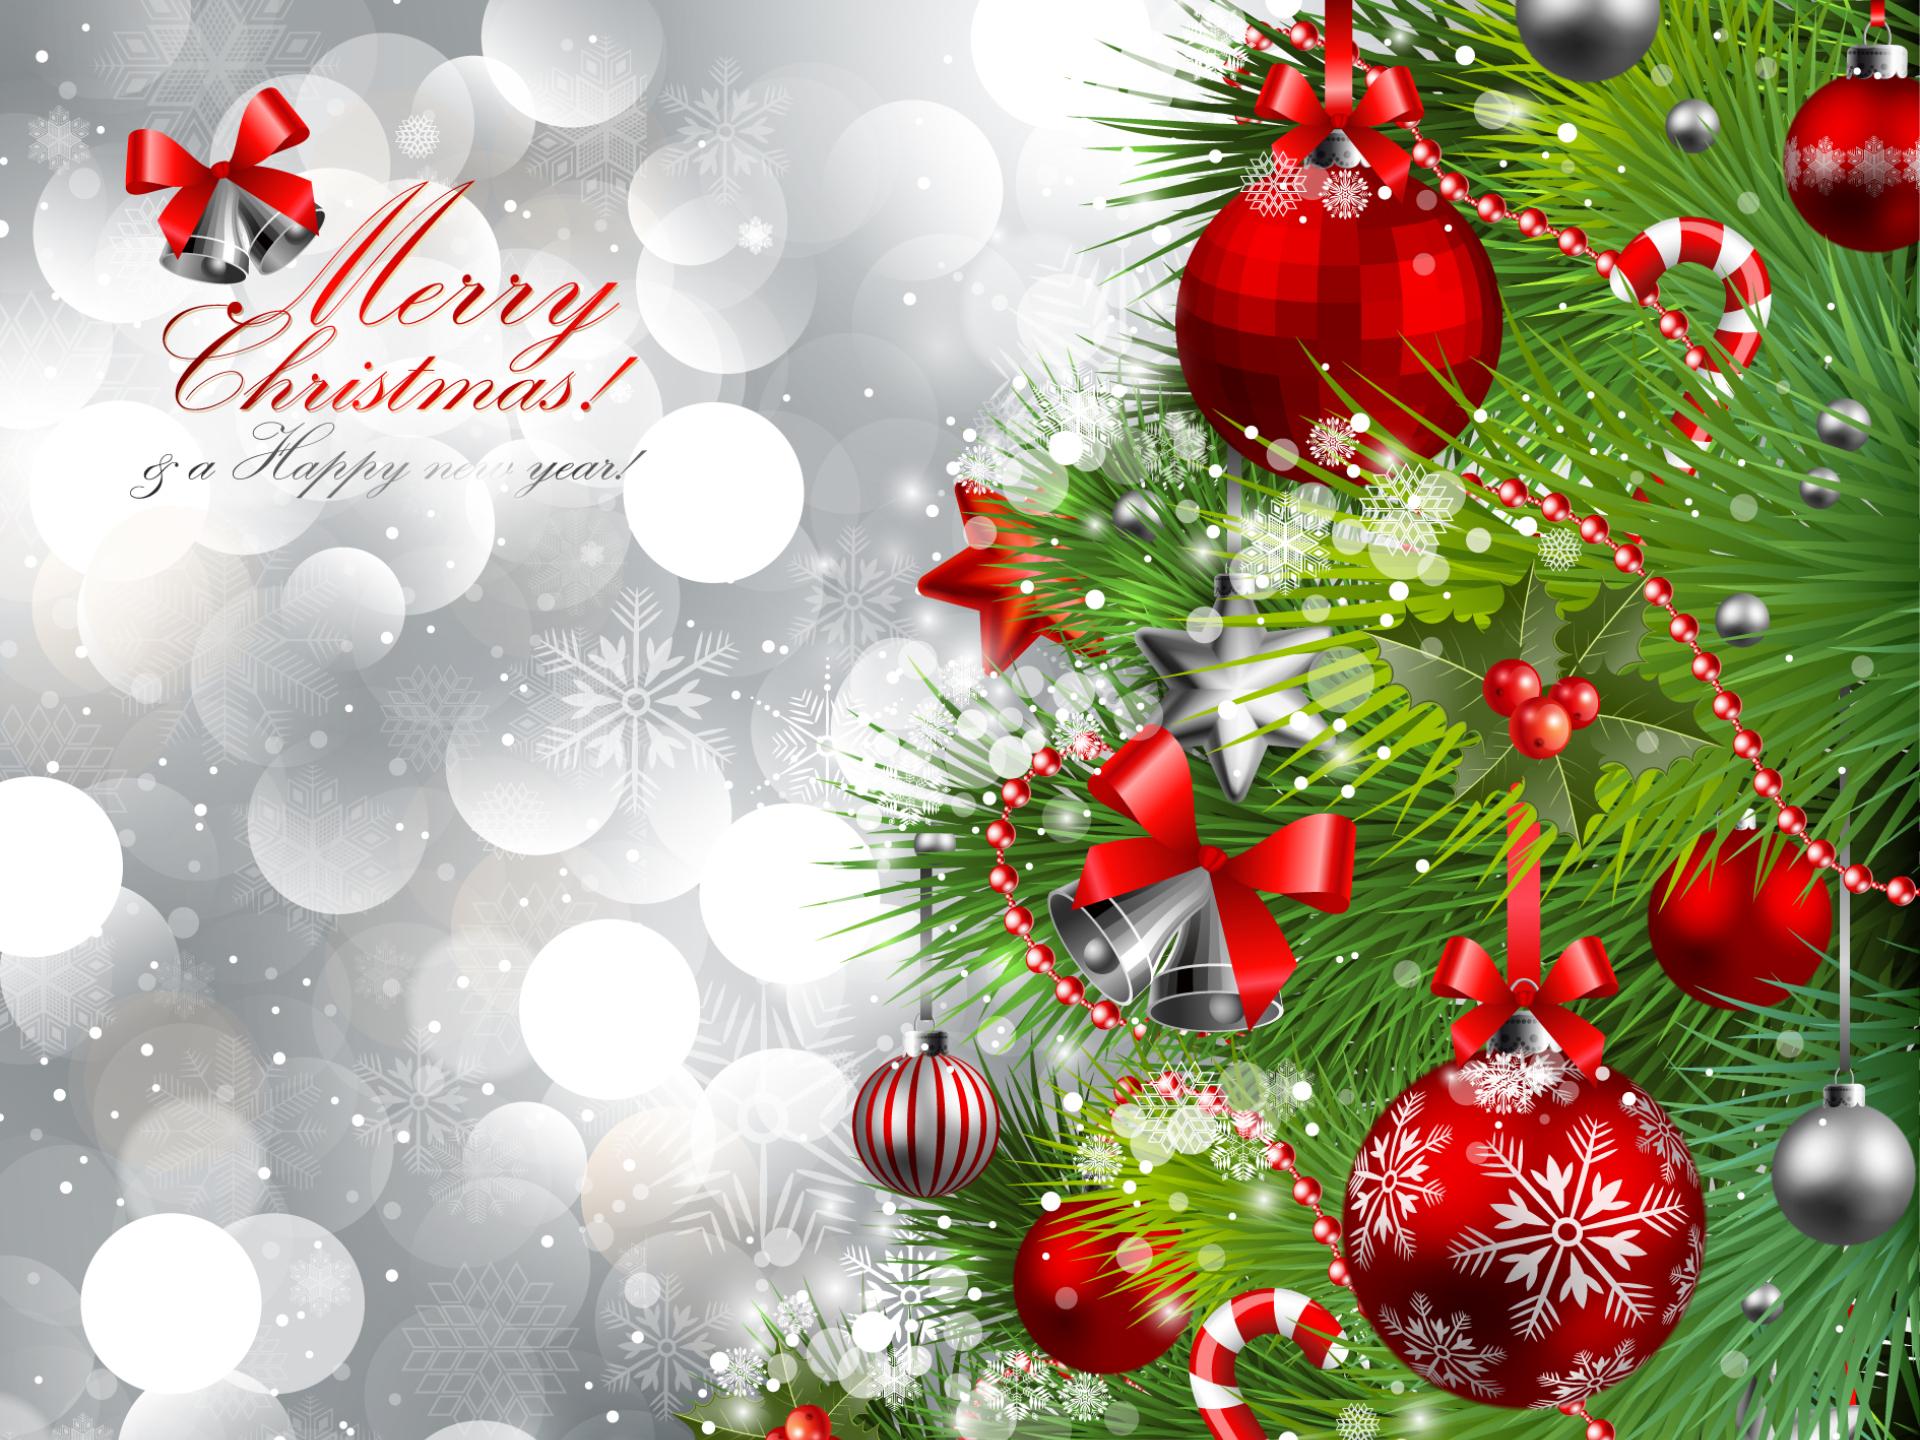 christmas wallpaper hd,christmas ornament,christmas decoration,christmas tree,christmas,tree